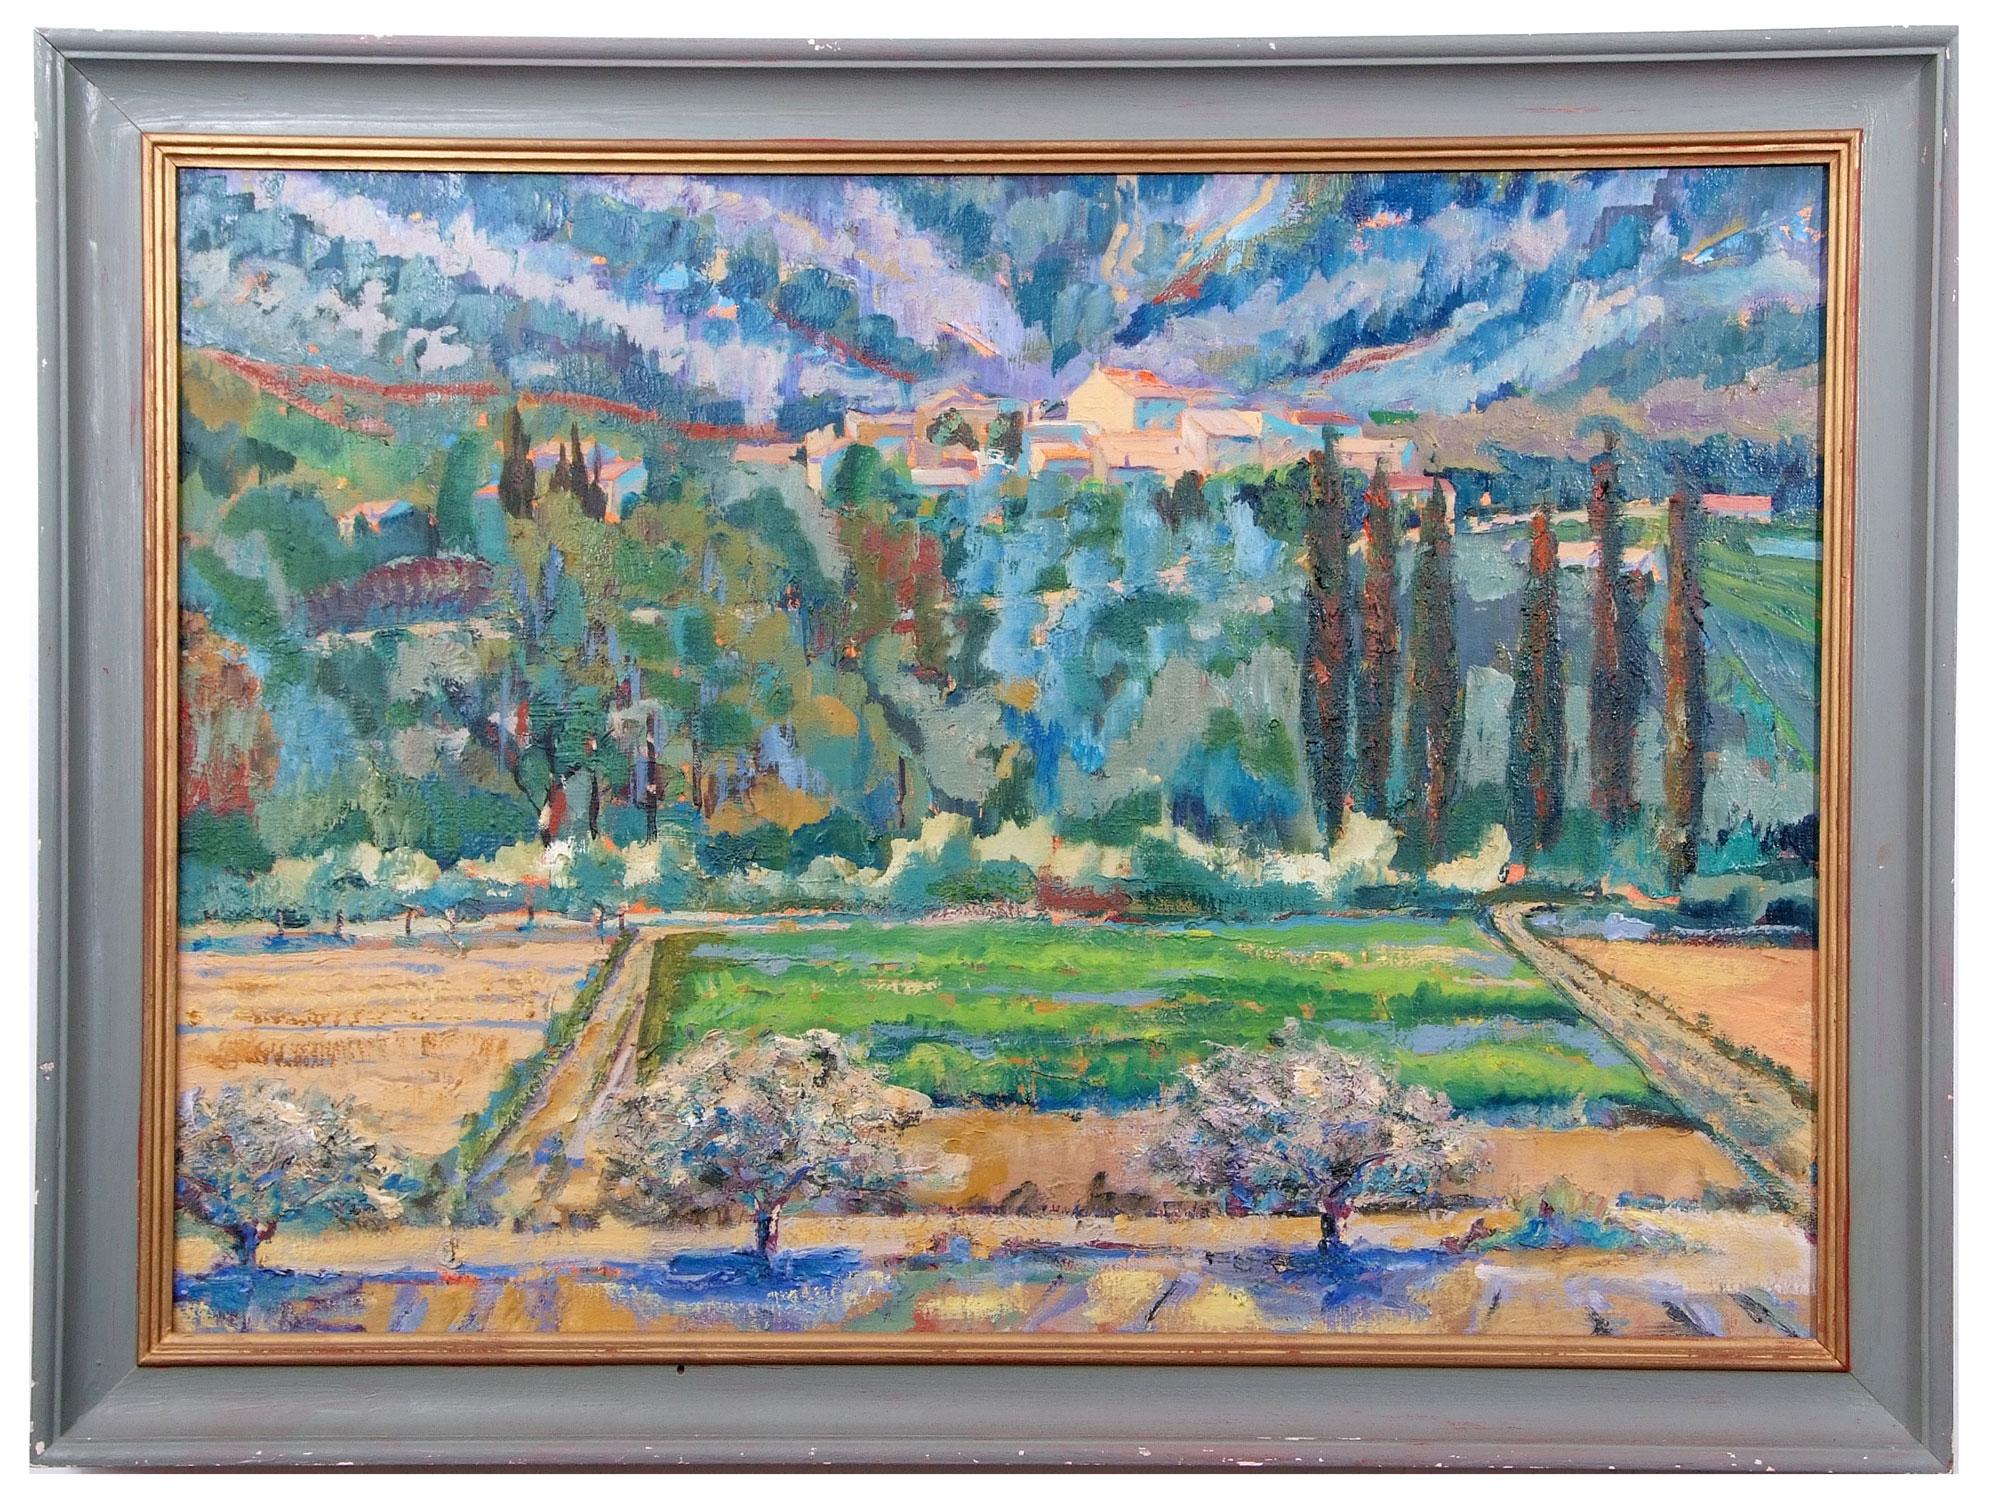 •AR Martin Battye (born 1952), Continental landscape, oil on canvas, 49 x 69cm